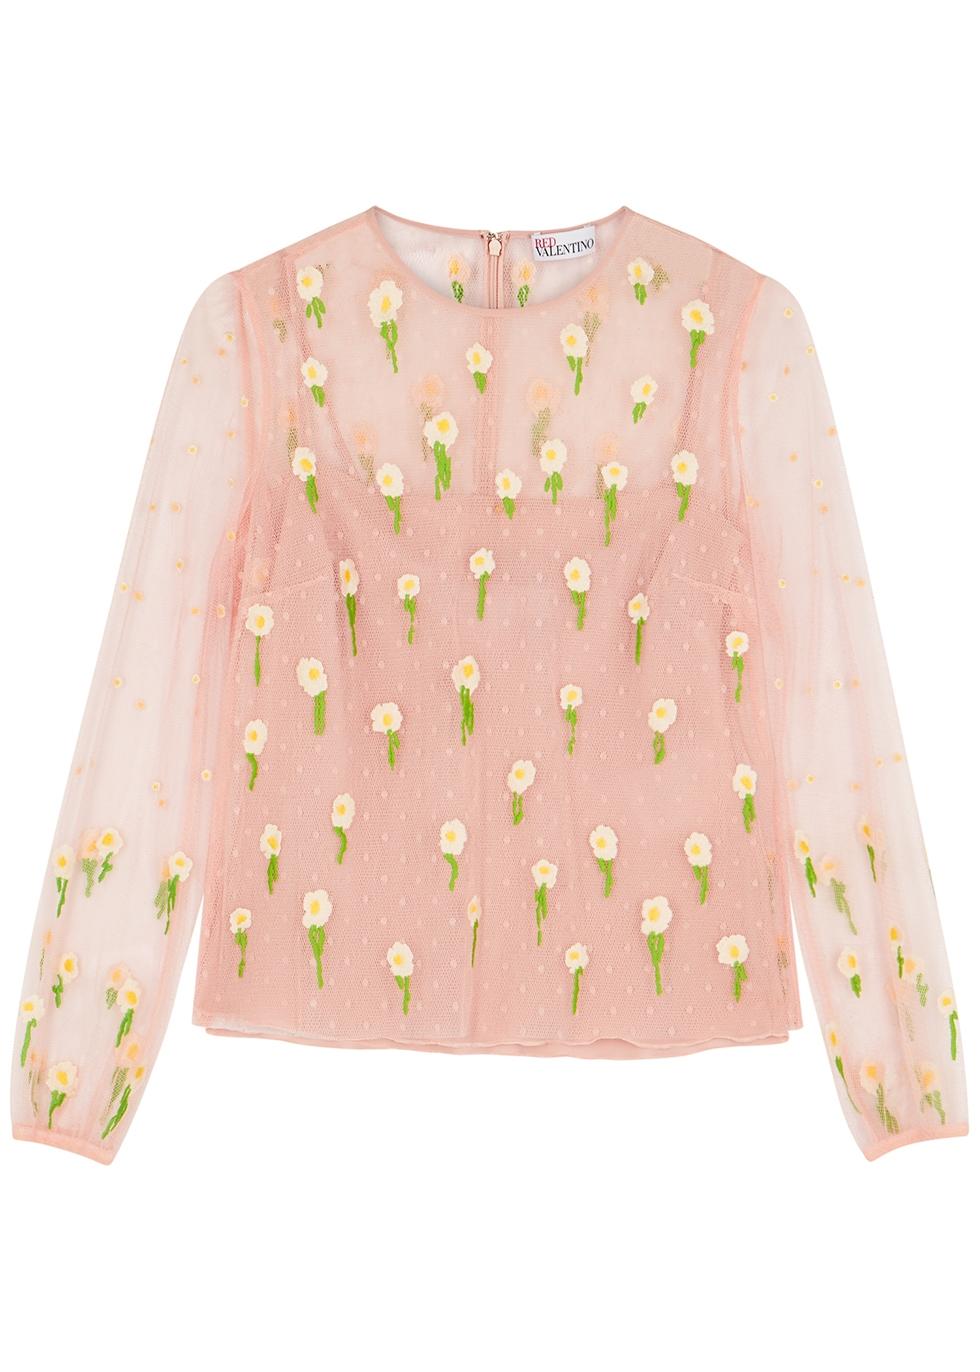 Light pink floral-embroidered point d'esprit top